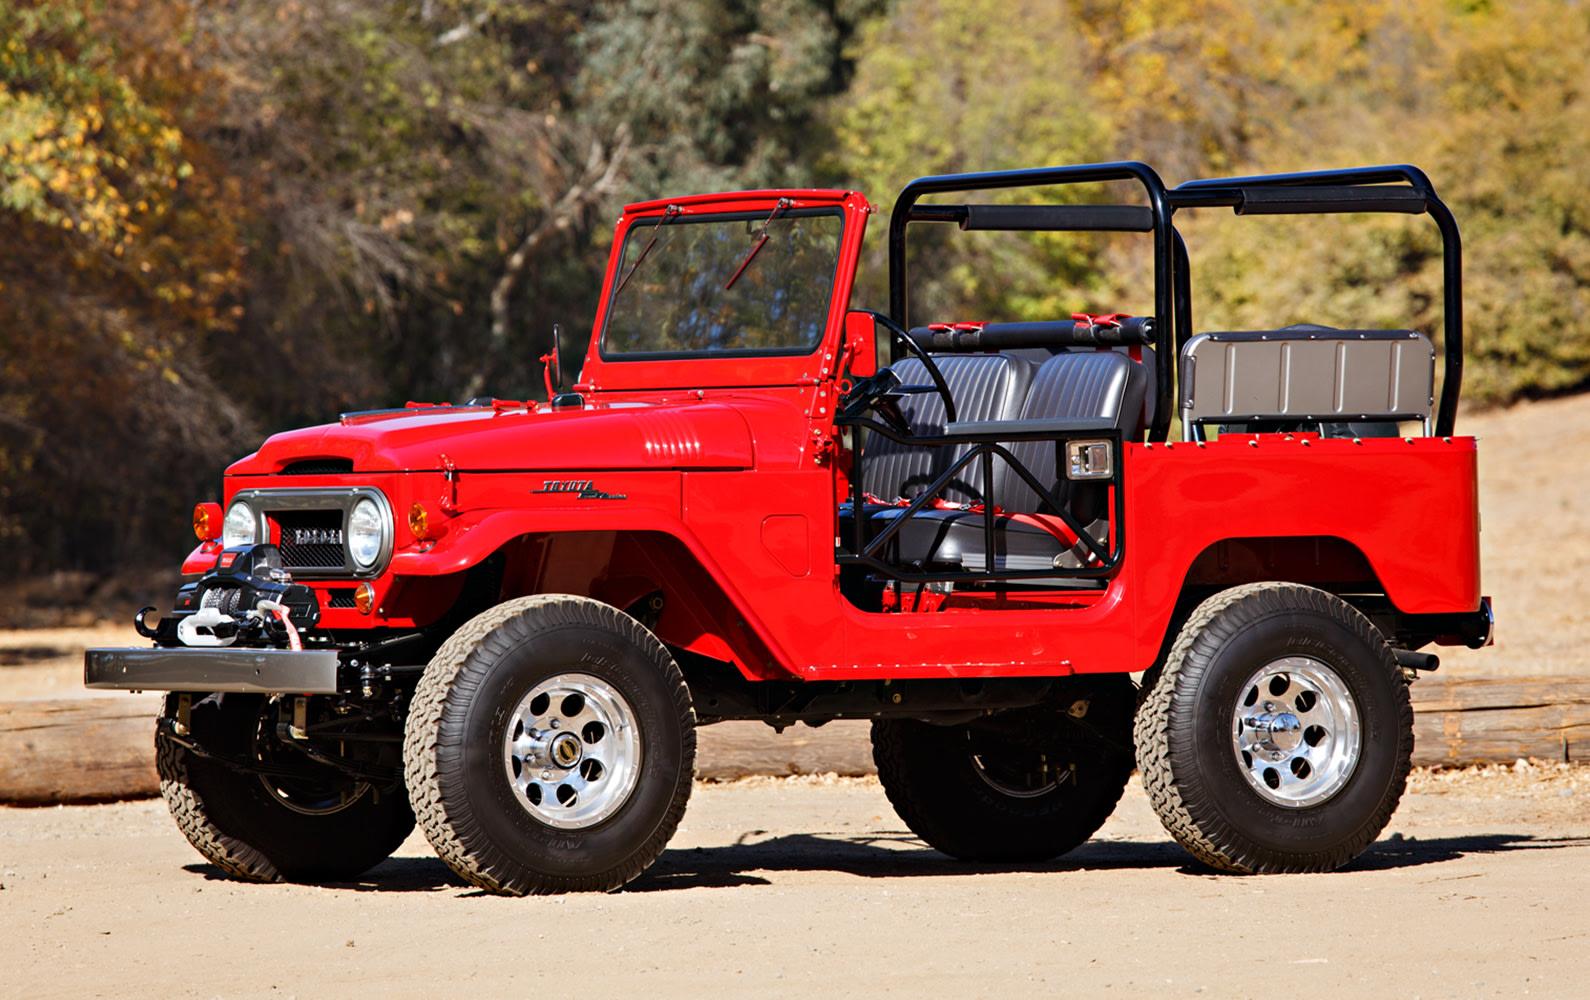 Prod/O21A - Scottsdale 2021/1429 - 1966 Toyota FJ40 Land Cruiser/1966_Toyota_FJ40_Land_Cruiser_51_alydw8